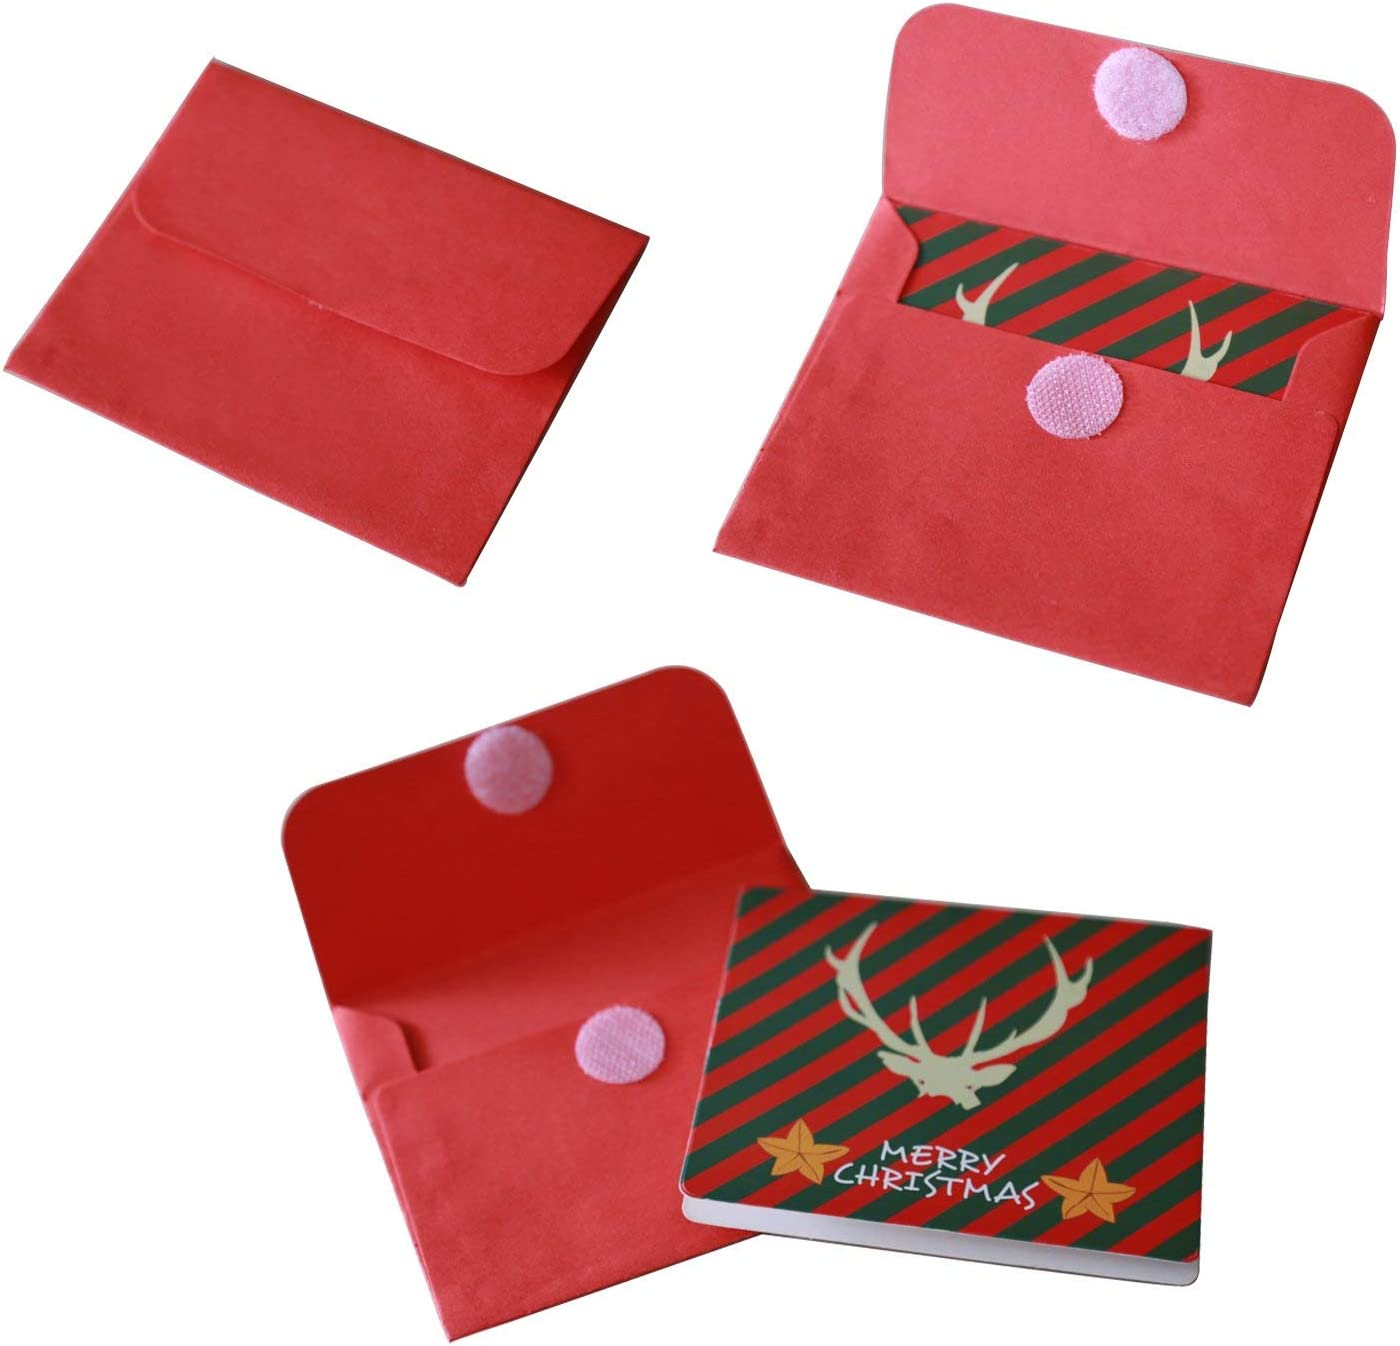 Cintas De Velcro 20 Mm De Diámetro Cinta Adhesiva De Nailon Para Monedas Y Ganchos Tiras De Velcro Para Colgar Ropa De Costura Manualidades Para Niños Color Blanco 100 Pares Hogar